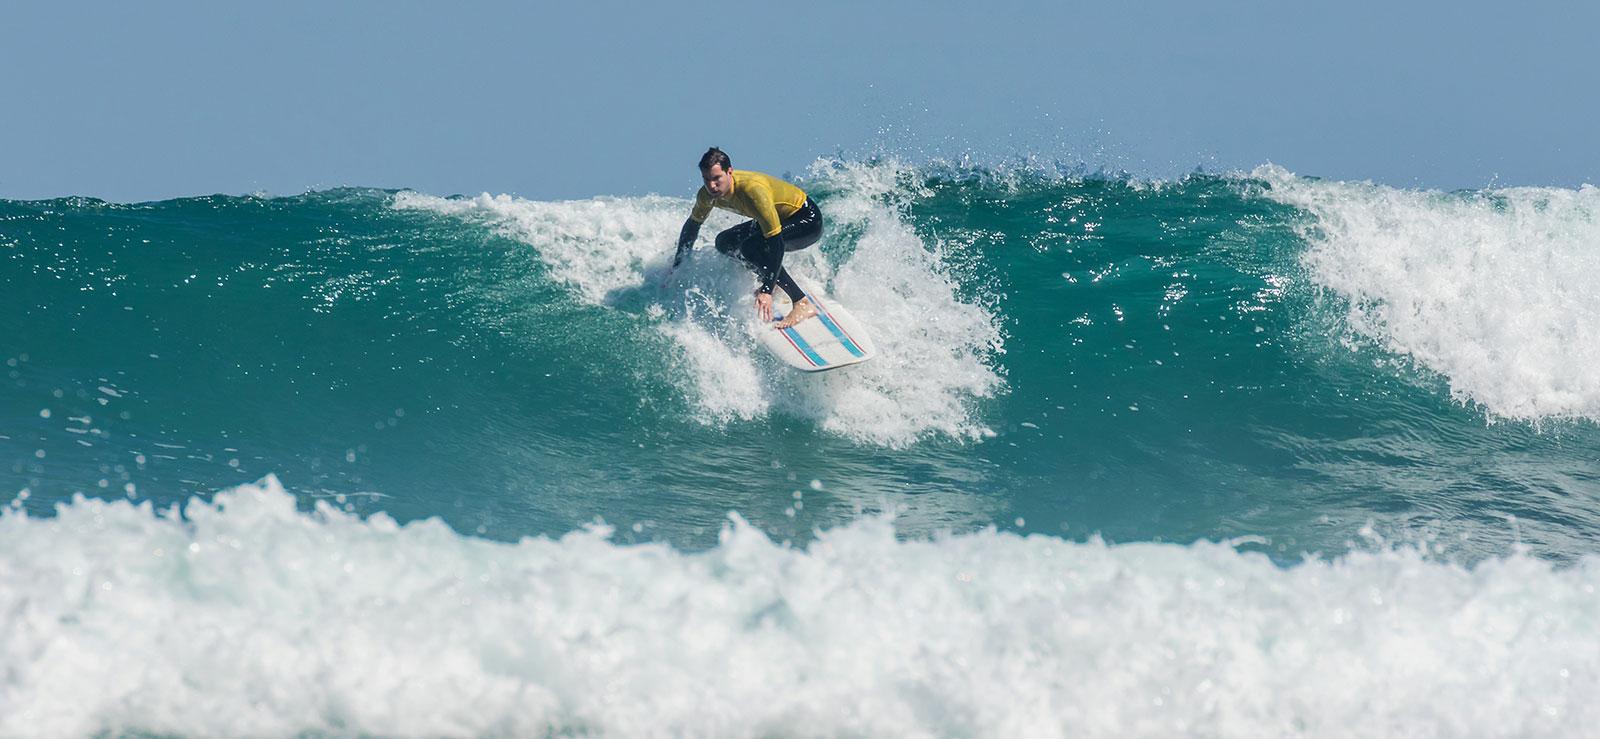 isa level 1 surfing skills